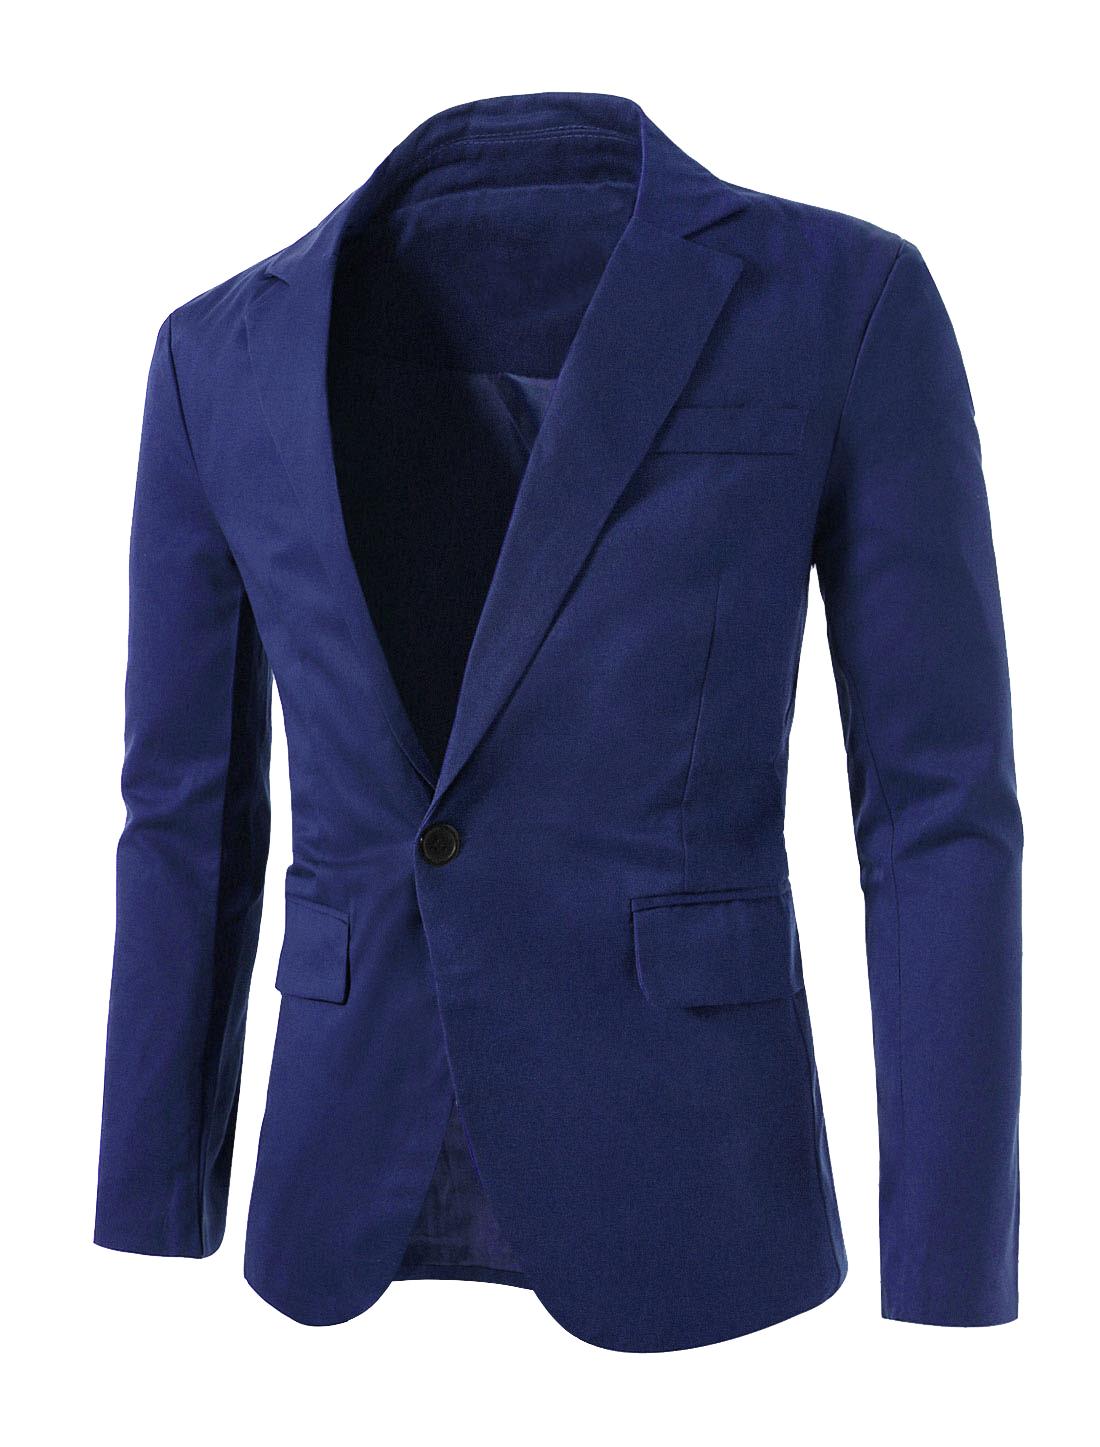 Men Notched Lapel Long Sleeves Vent Back Casual Blazer Blue L